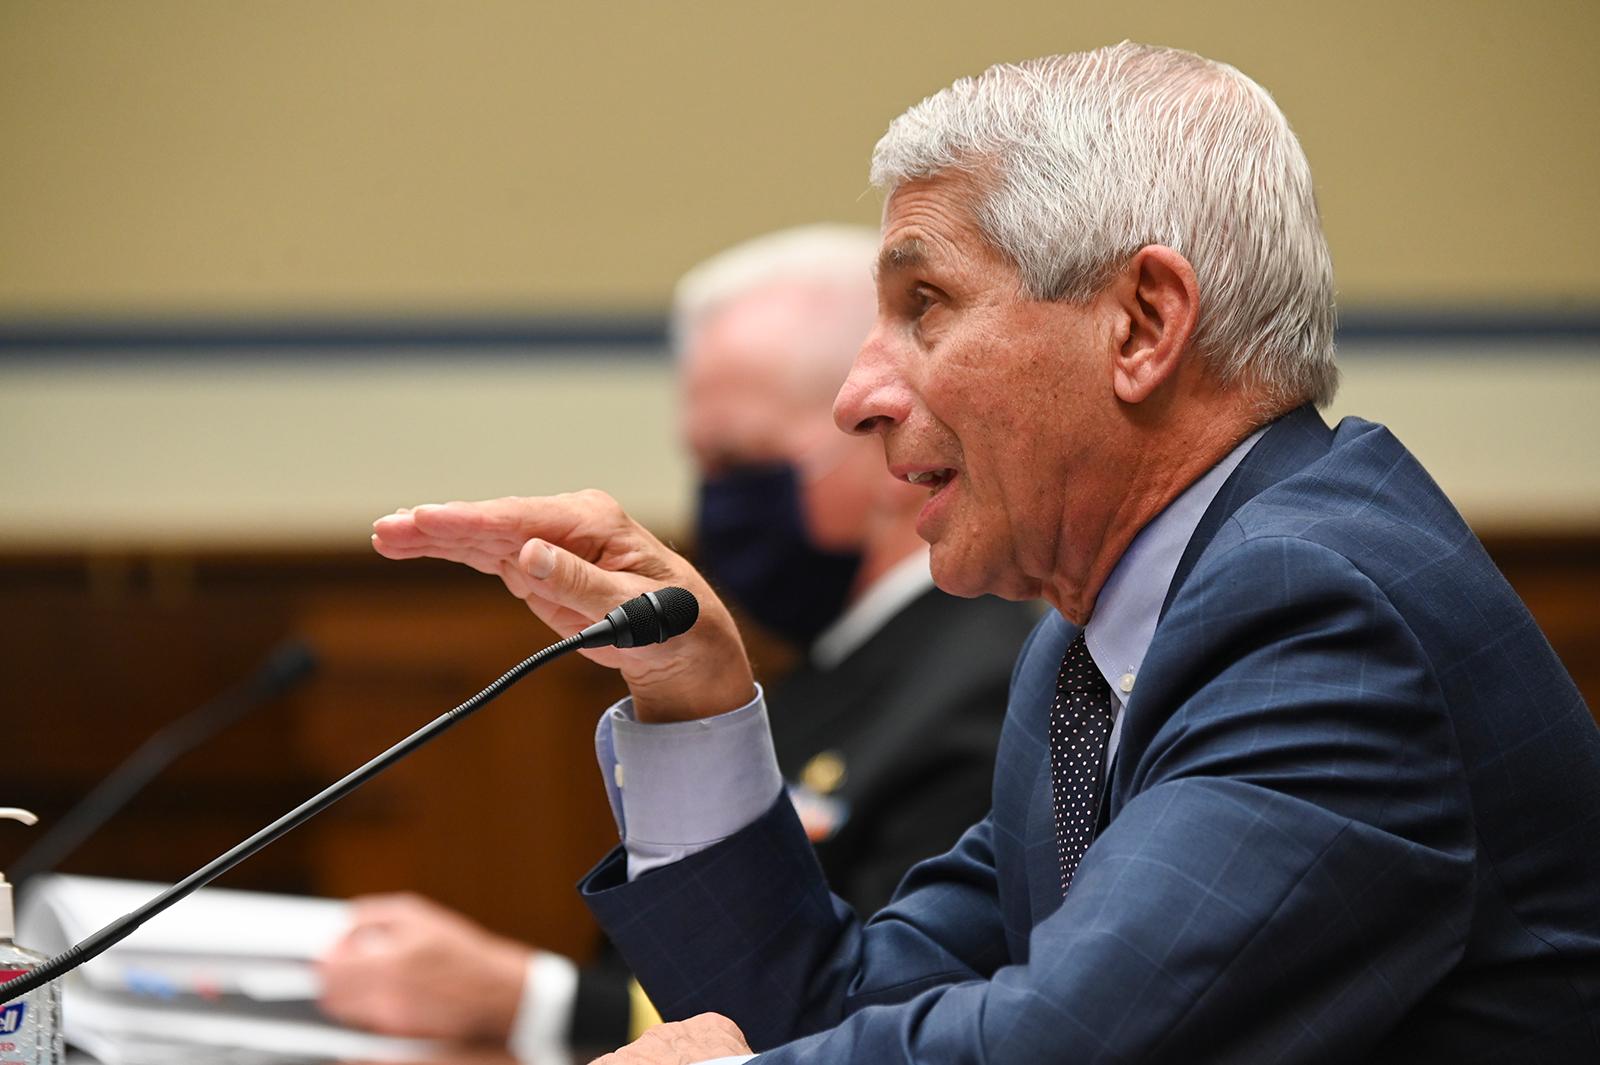 Anthony Fauci, during the Coronavirus Crisis hearing on July 31, in Washington, DC.